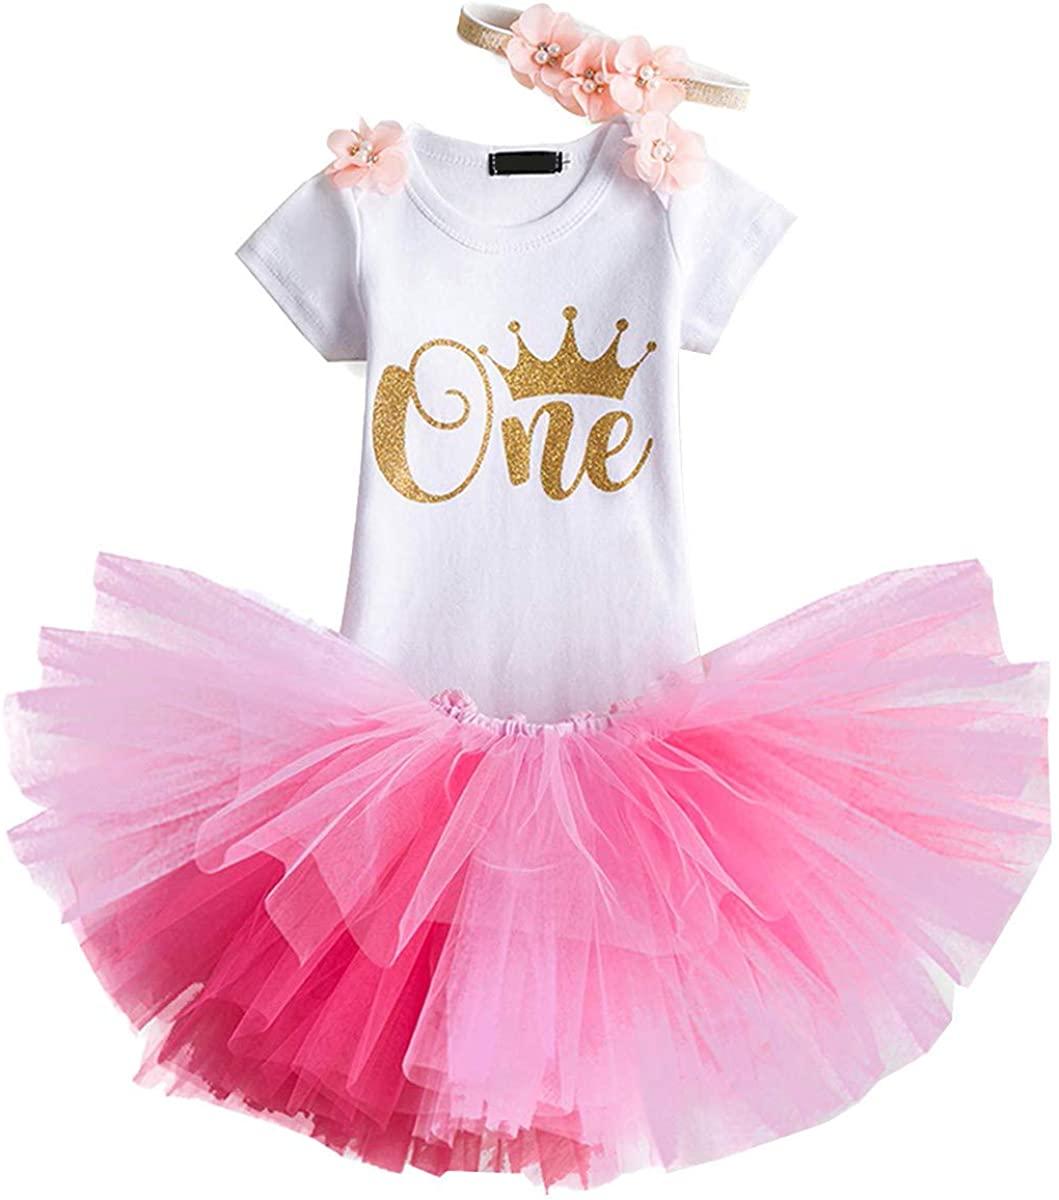 HIHCBF 1st Birthday Cake Smash 3pcs Outfits Baby Girls Romper + Tutu Skirt + Headband Princess Skirt Set for Photo Shoot